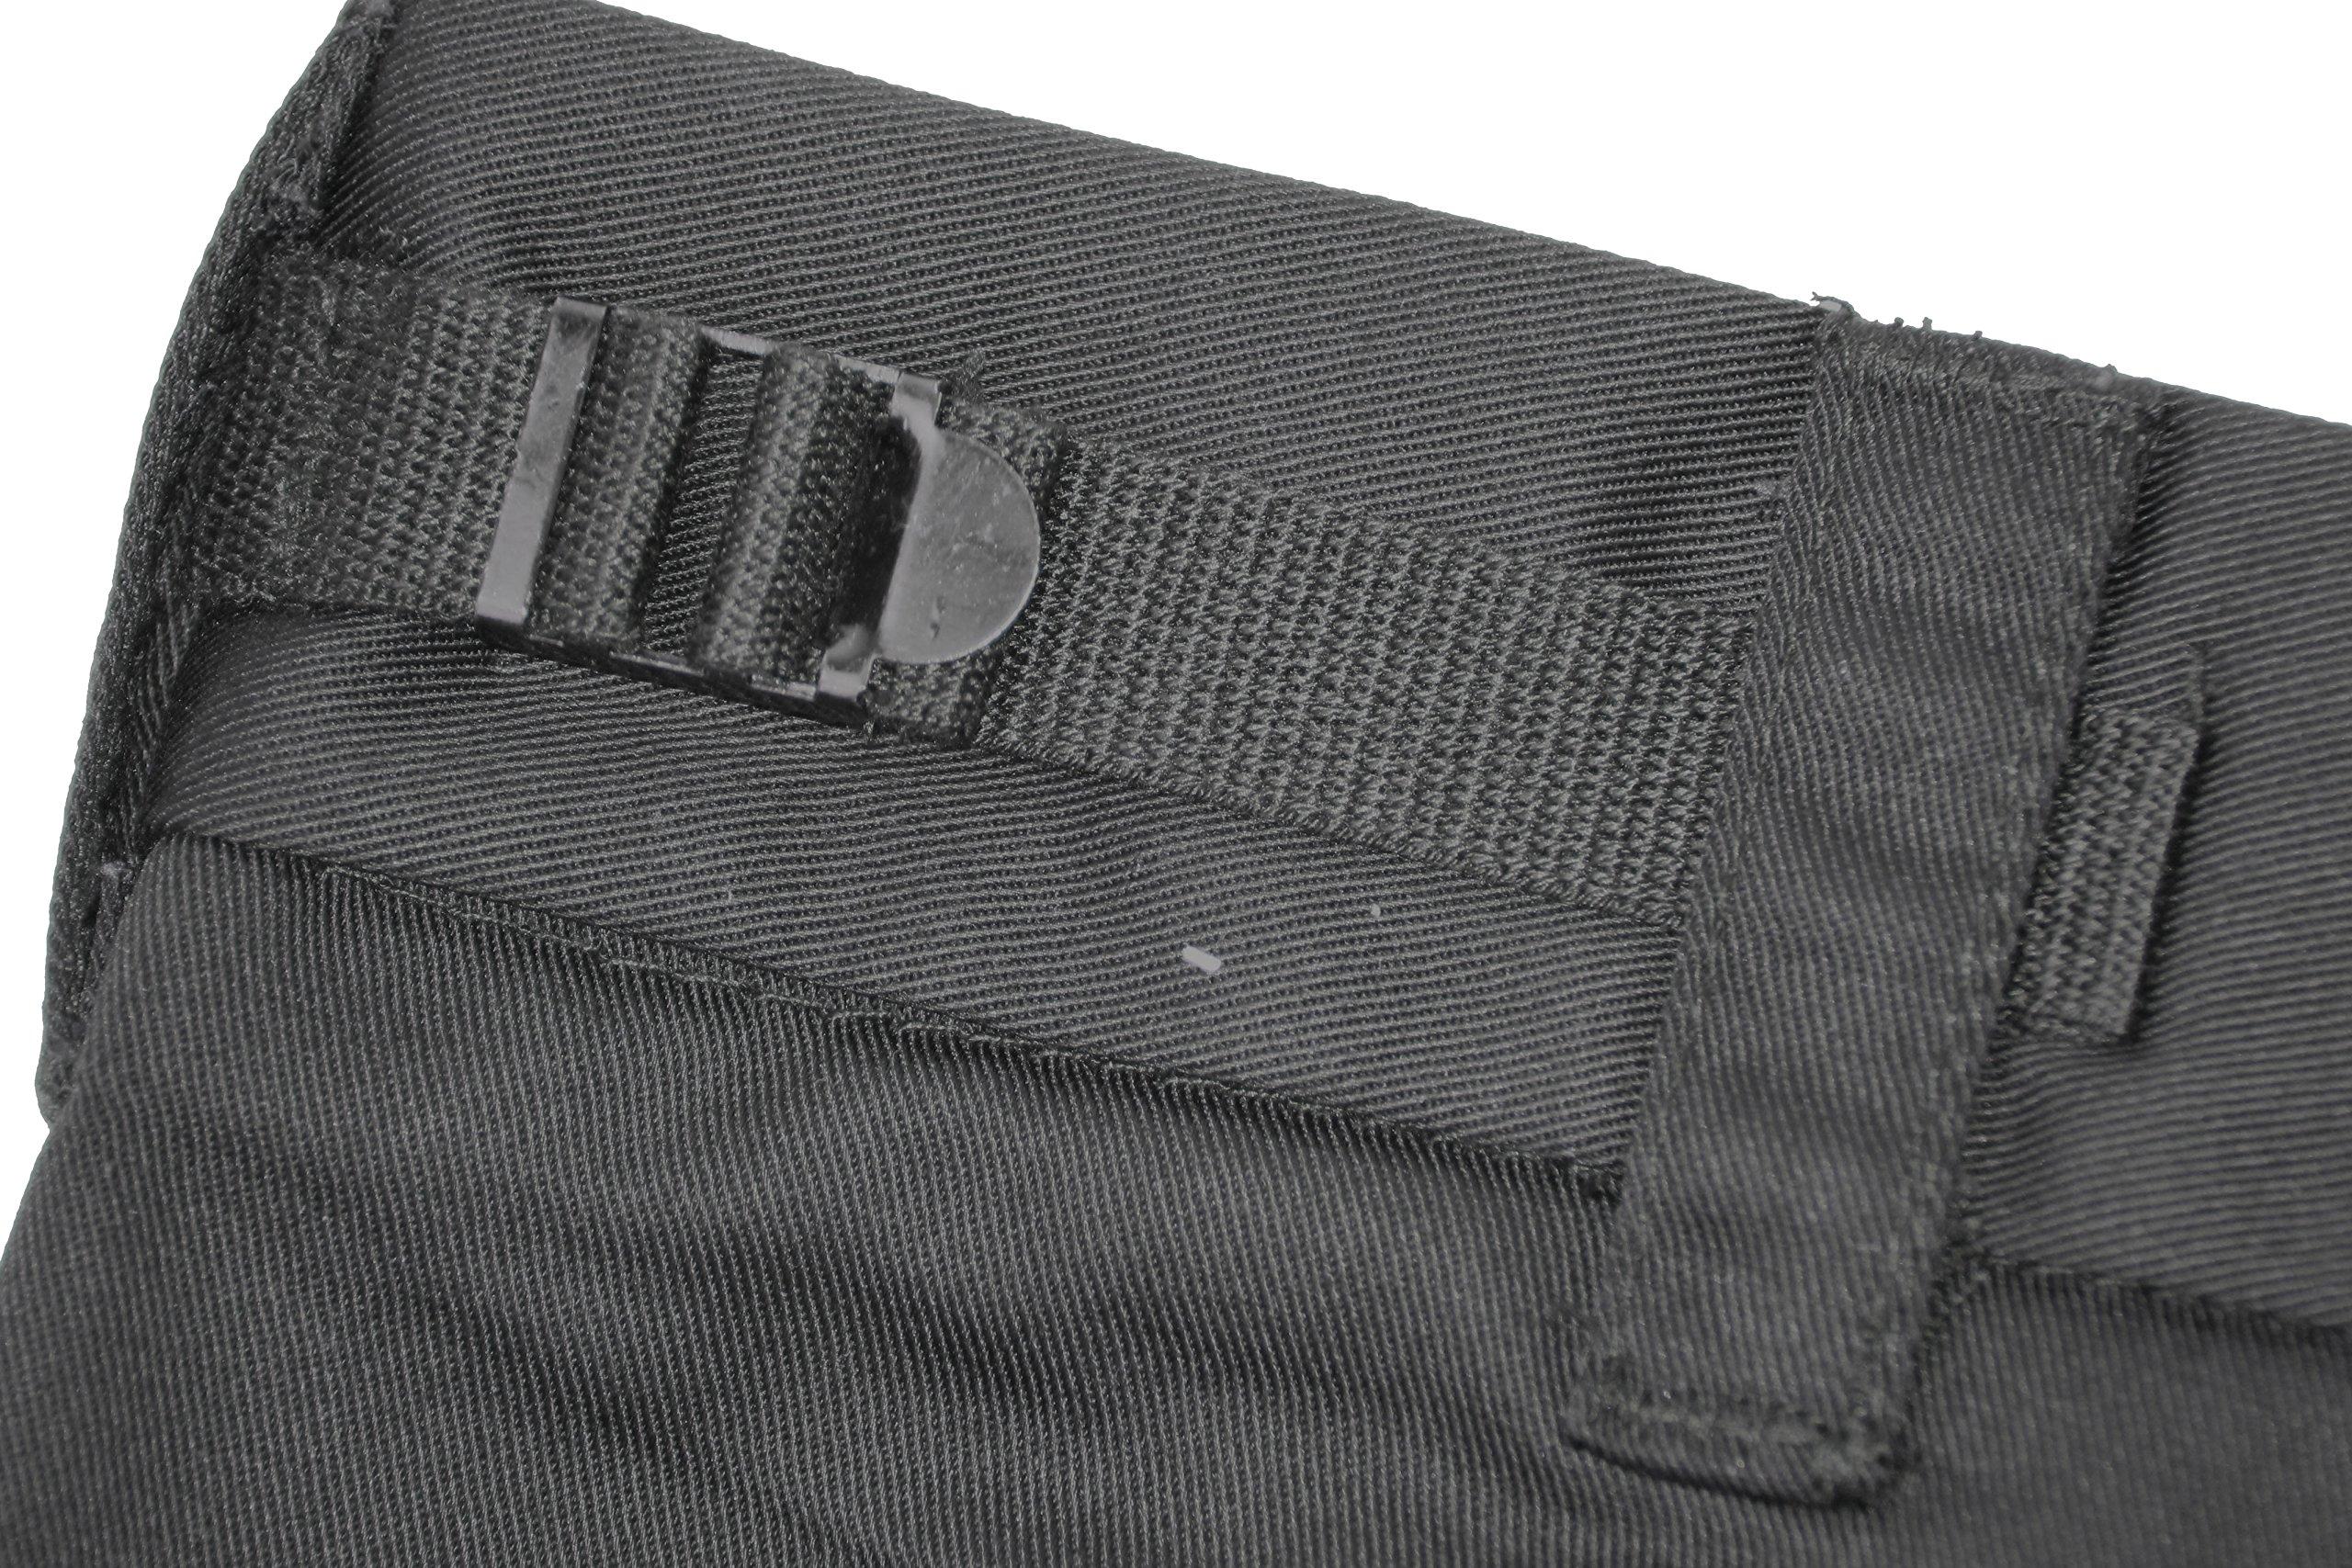 Army Universe Black Uniform 9 Pocket Cargo Pants fcd6dec5978